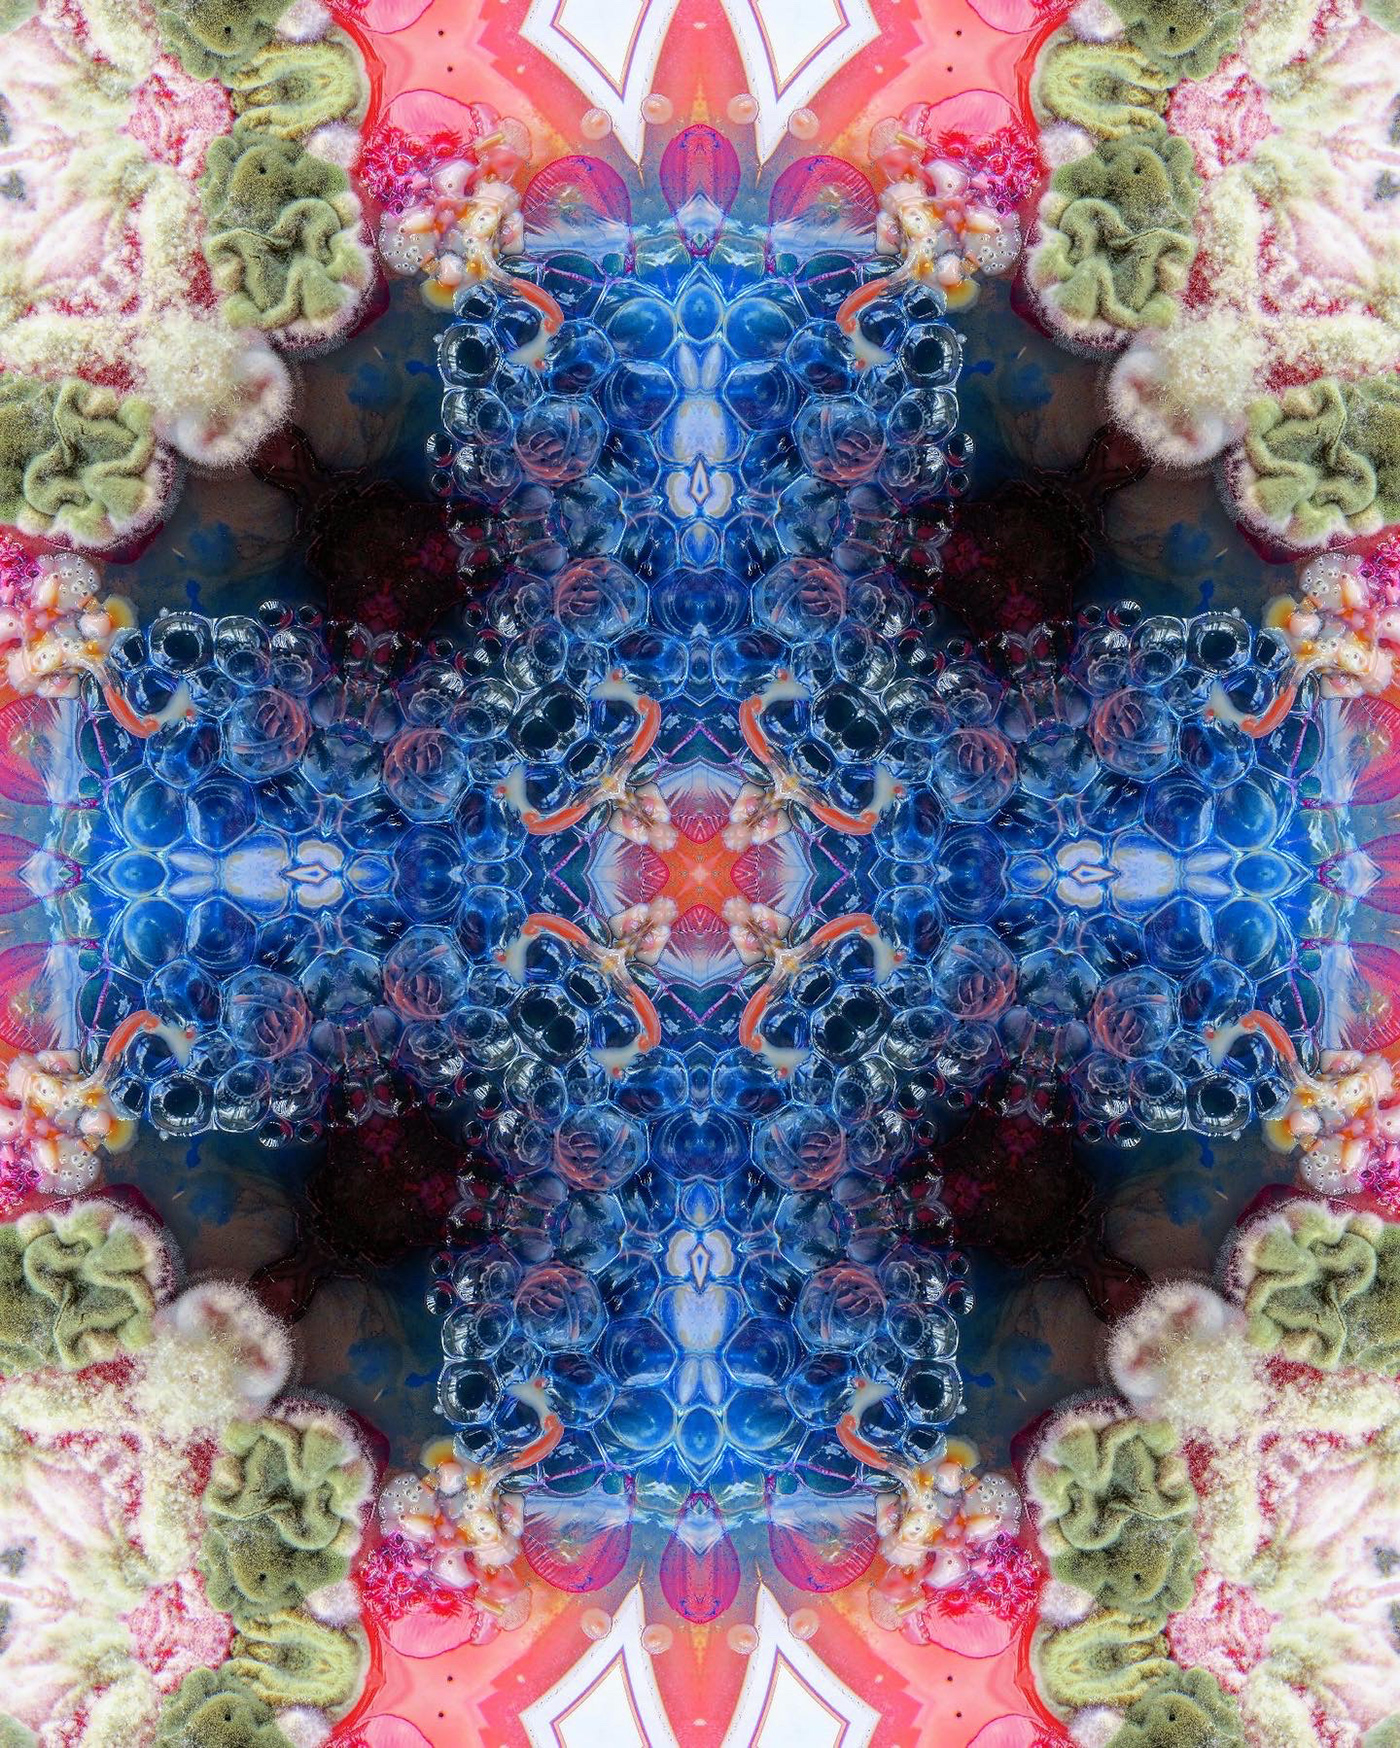 art artist Bacteria bio bioart blue colours contamination design FINEART fluffy fractal Fungi glass green Greens inspiration Interior kaleido Love manipulation mirror model molds moodboard Nature new pattern pink science texture wallpaper Window